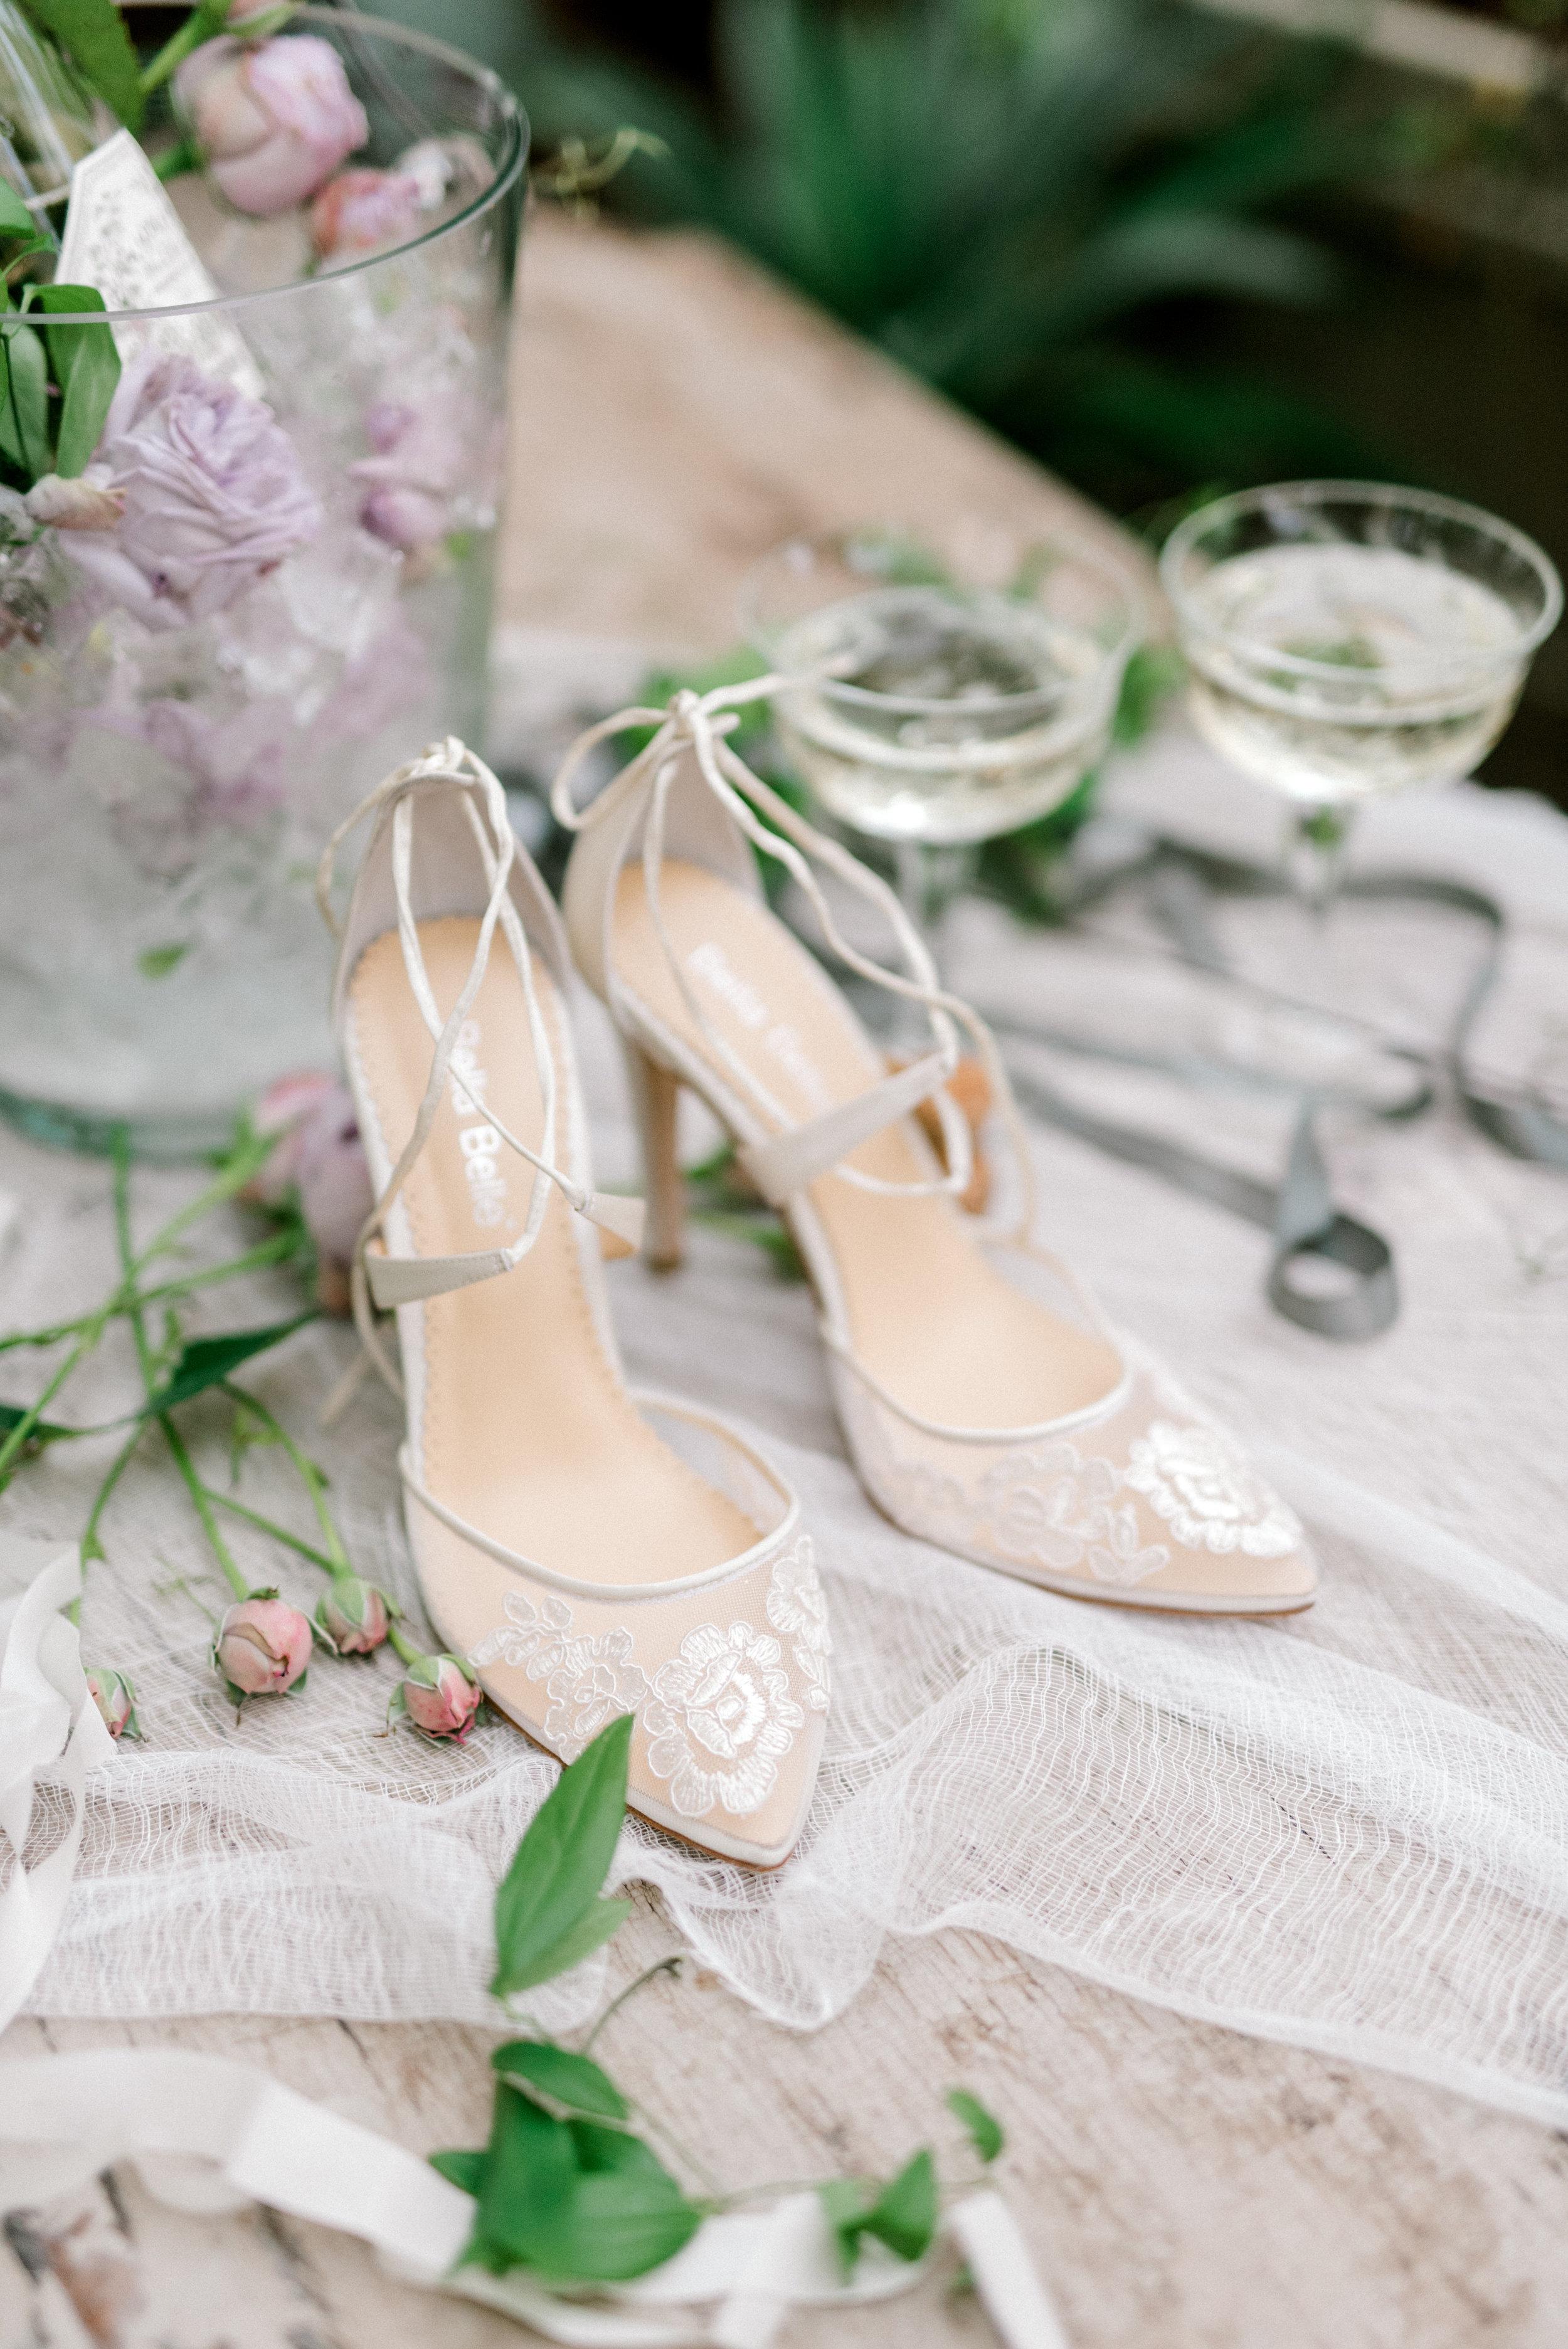 haley-richter-photography-jardin-de-buis-wedding-photos-greenhouse-wedding-bhldn-gown-lilac-wedding-bouquet-beaded-wedding-gown-new-jersey-weddings-garden-wedding-bella-belle-wedding-shoes-lace-romantic-shoes-heels